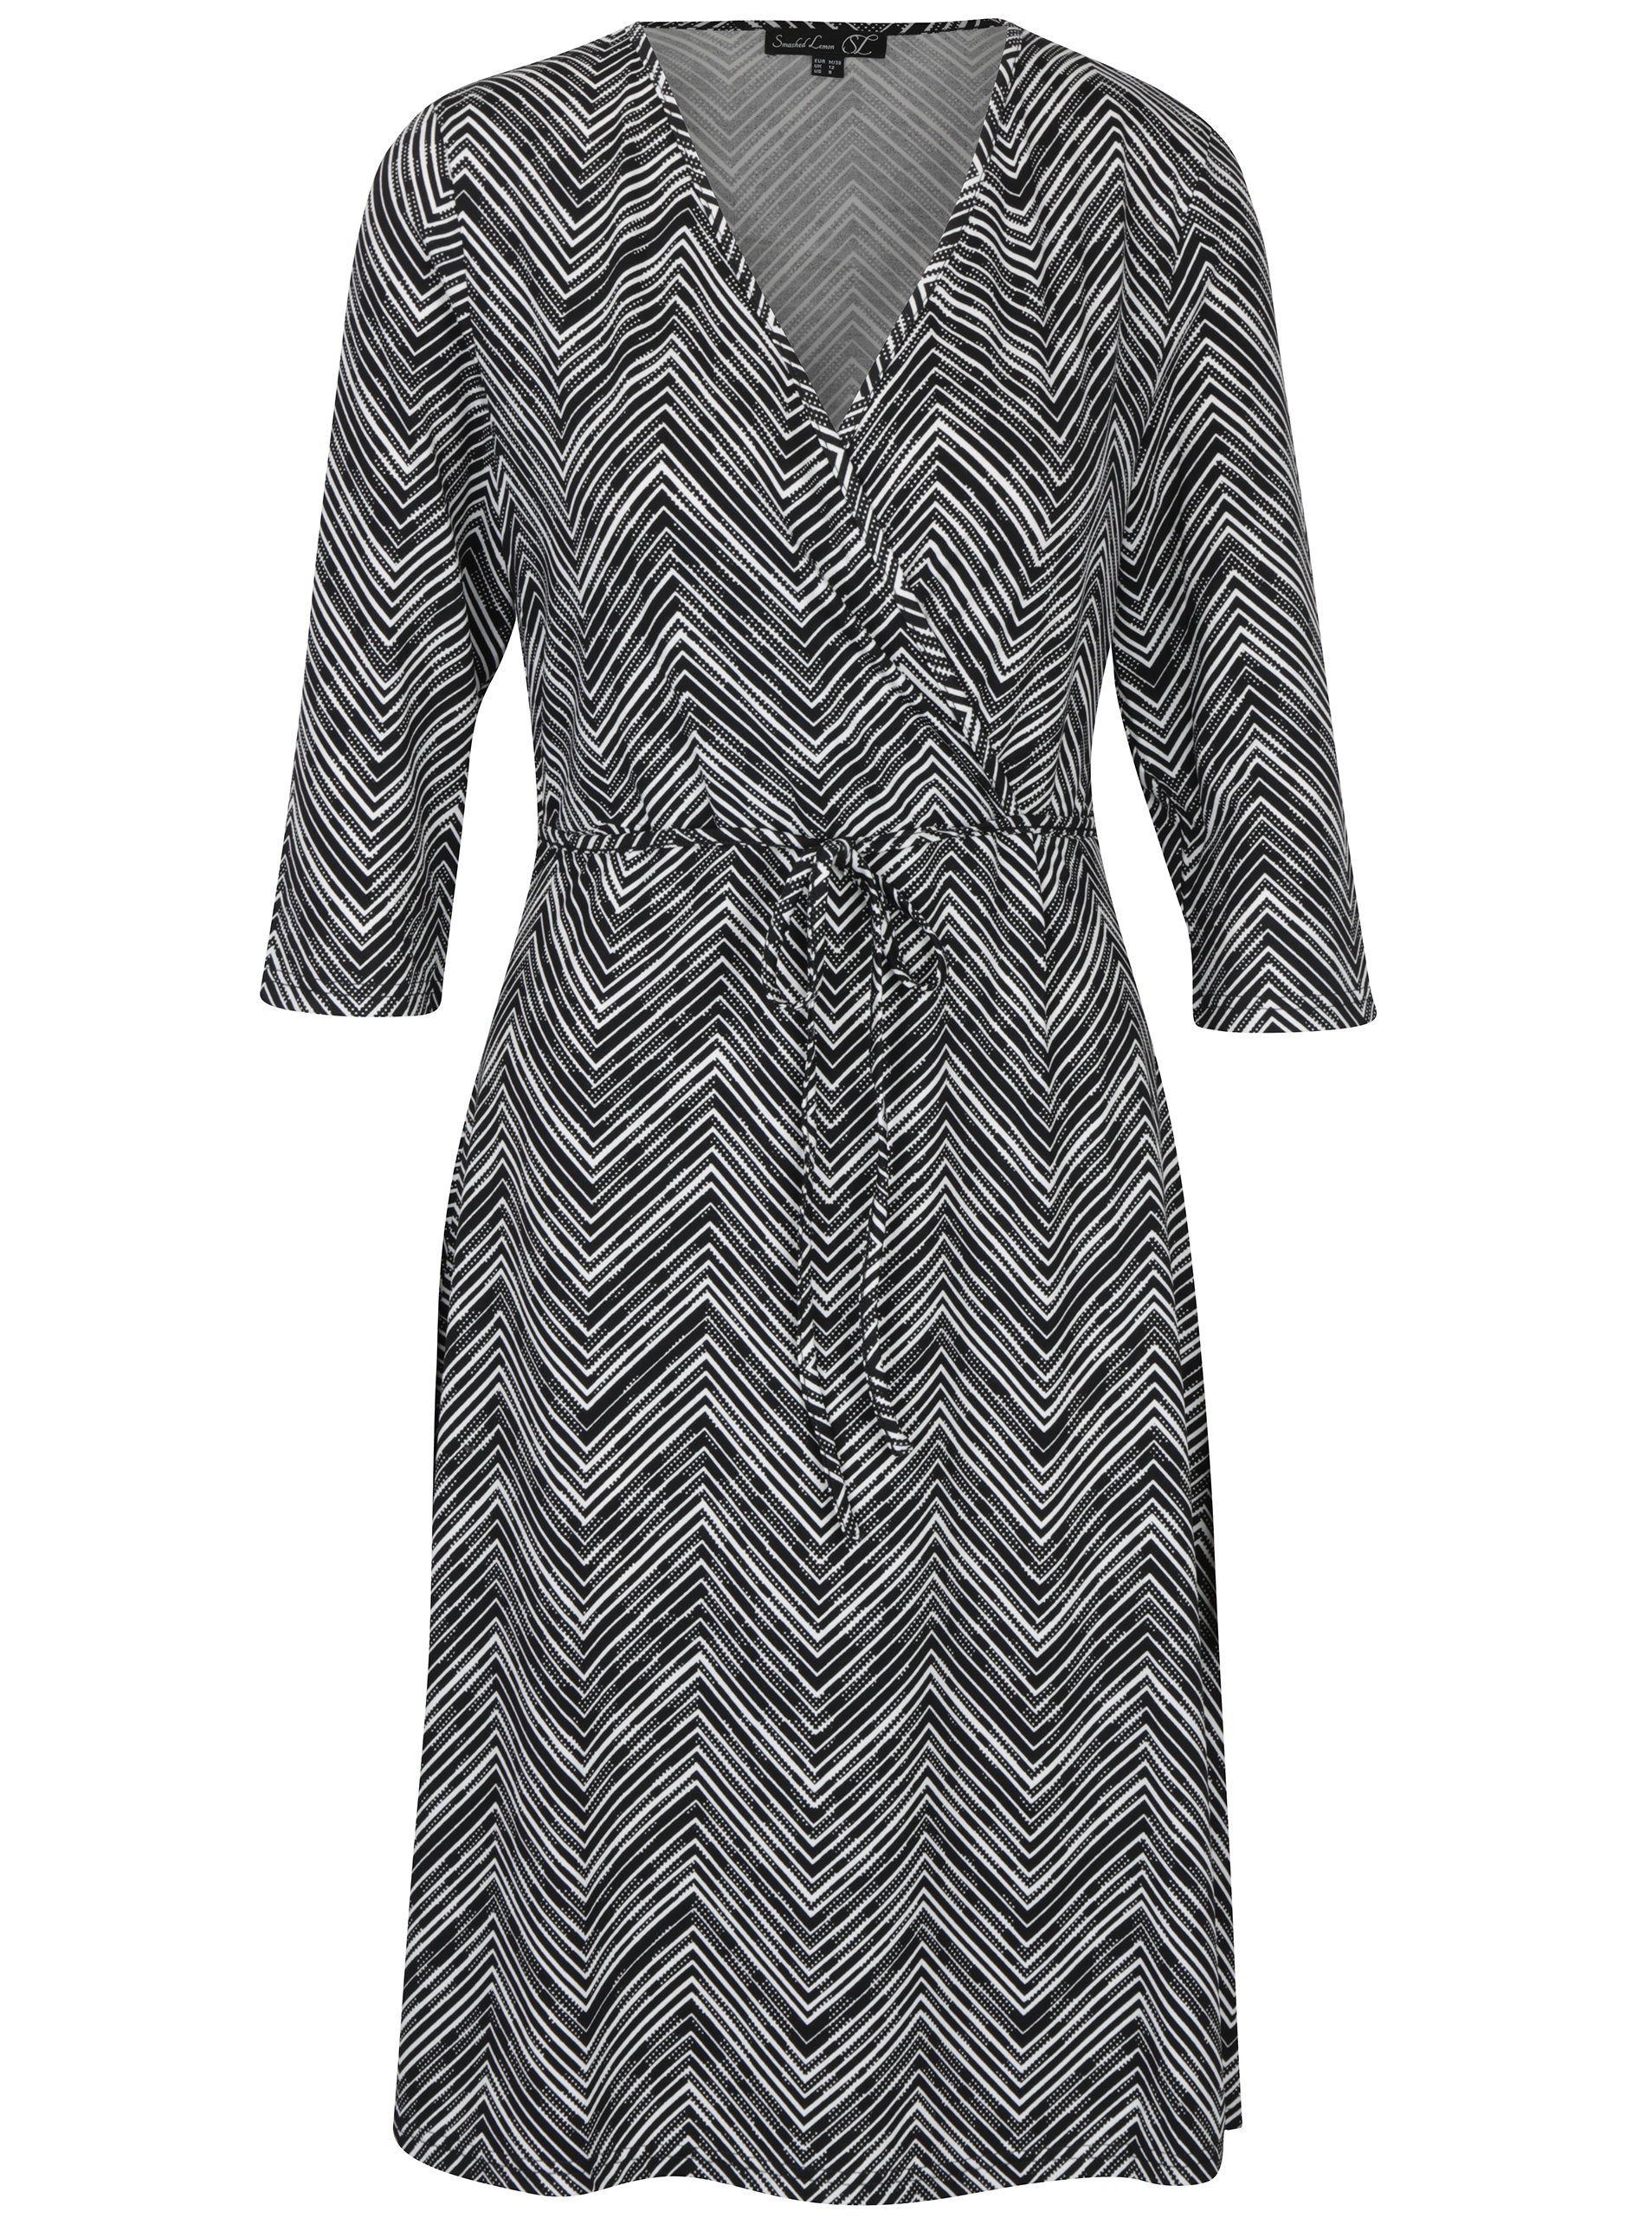 98c9e8856cf3 Čierne vzorované šaty Smashed Lemon ...